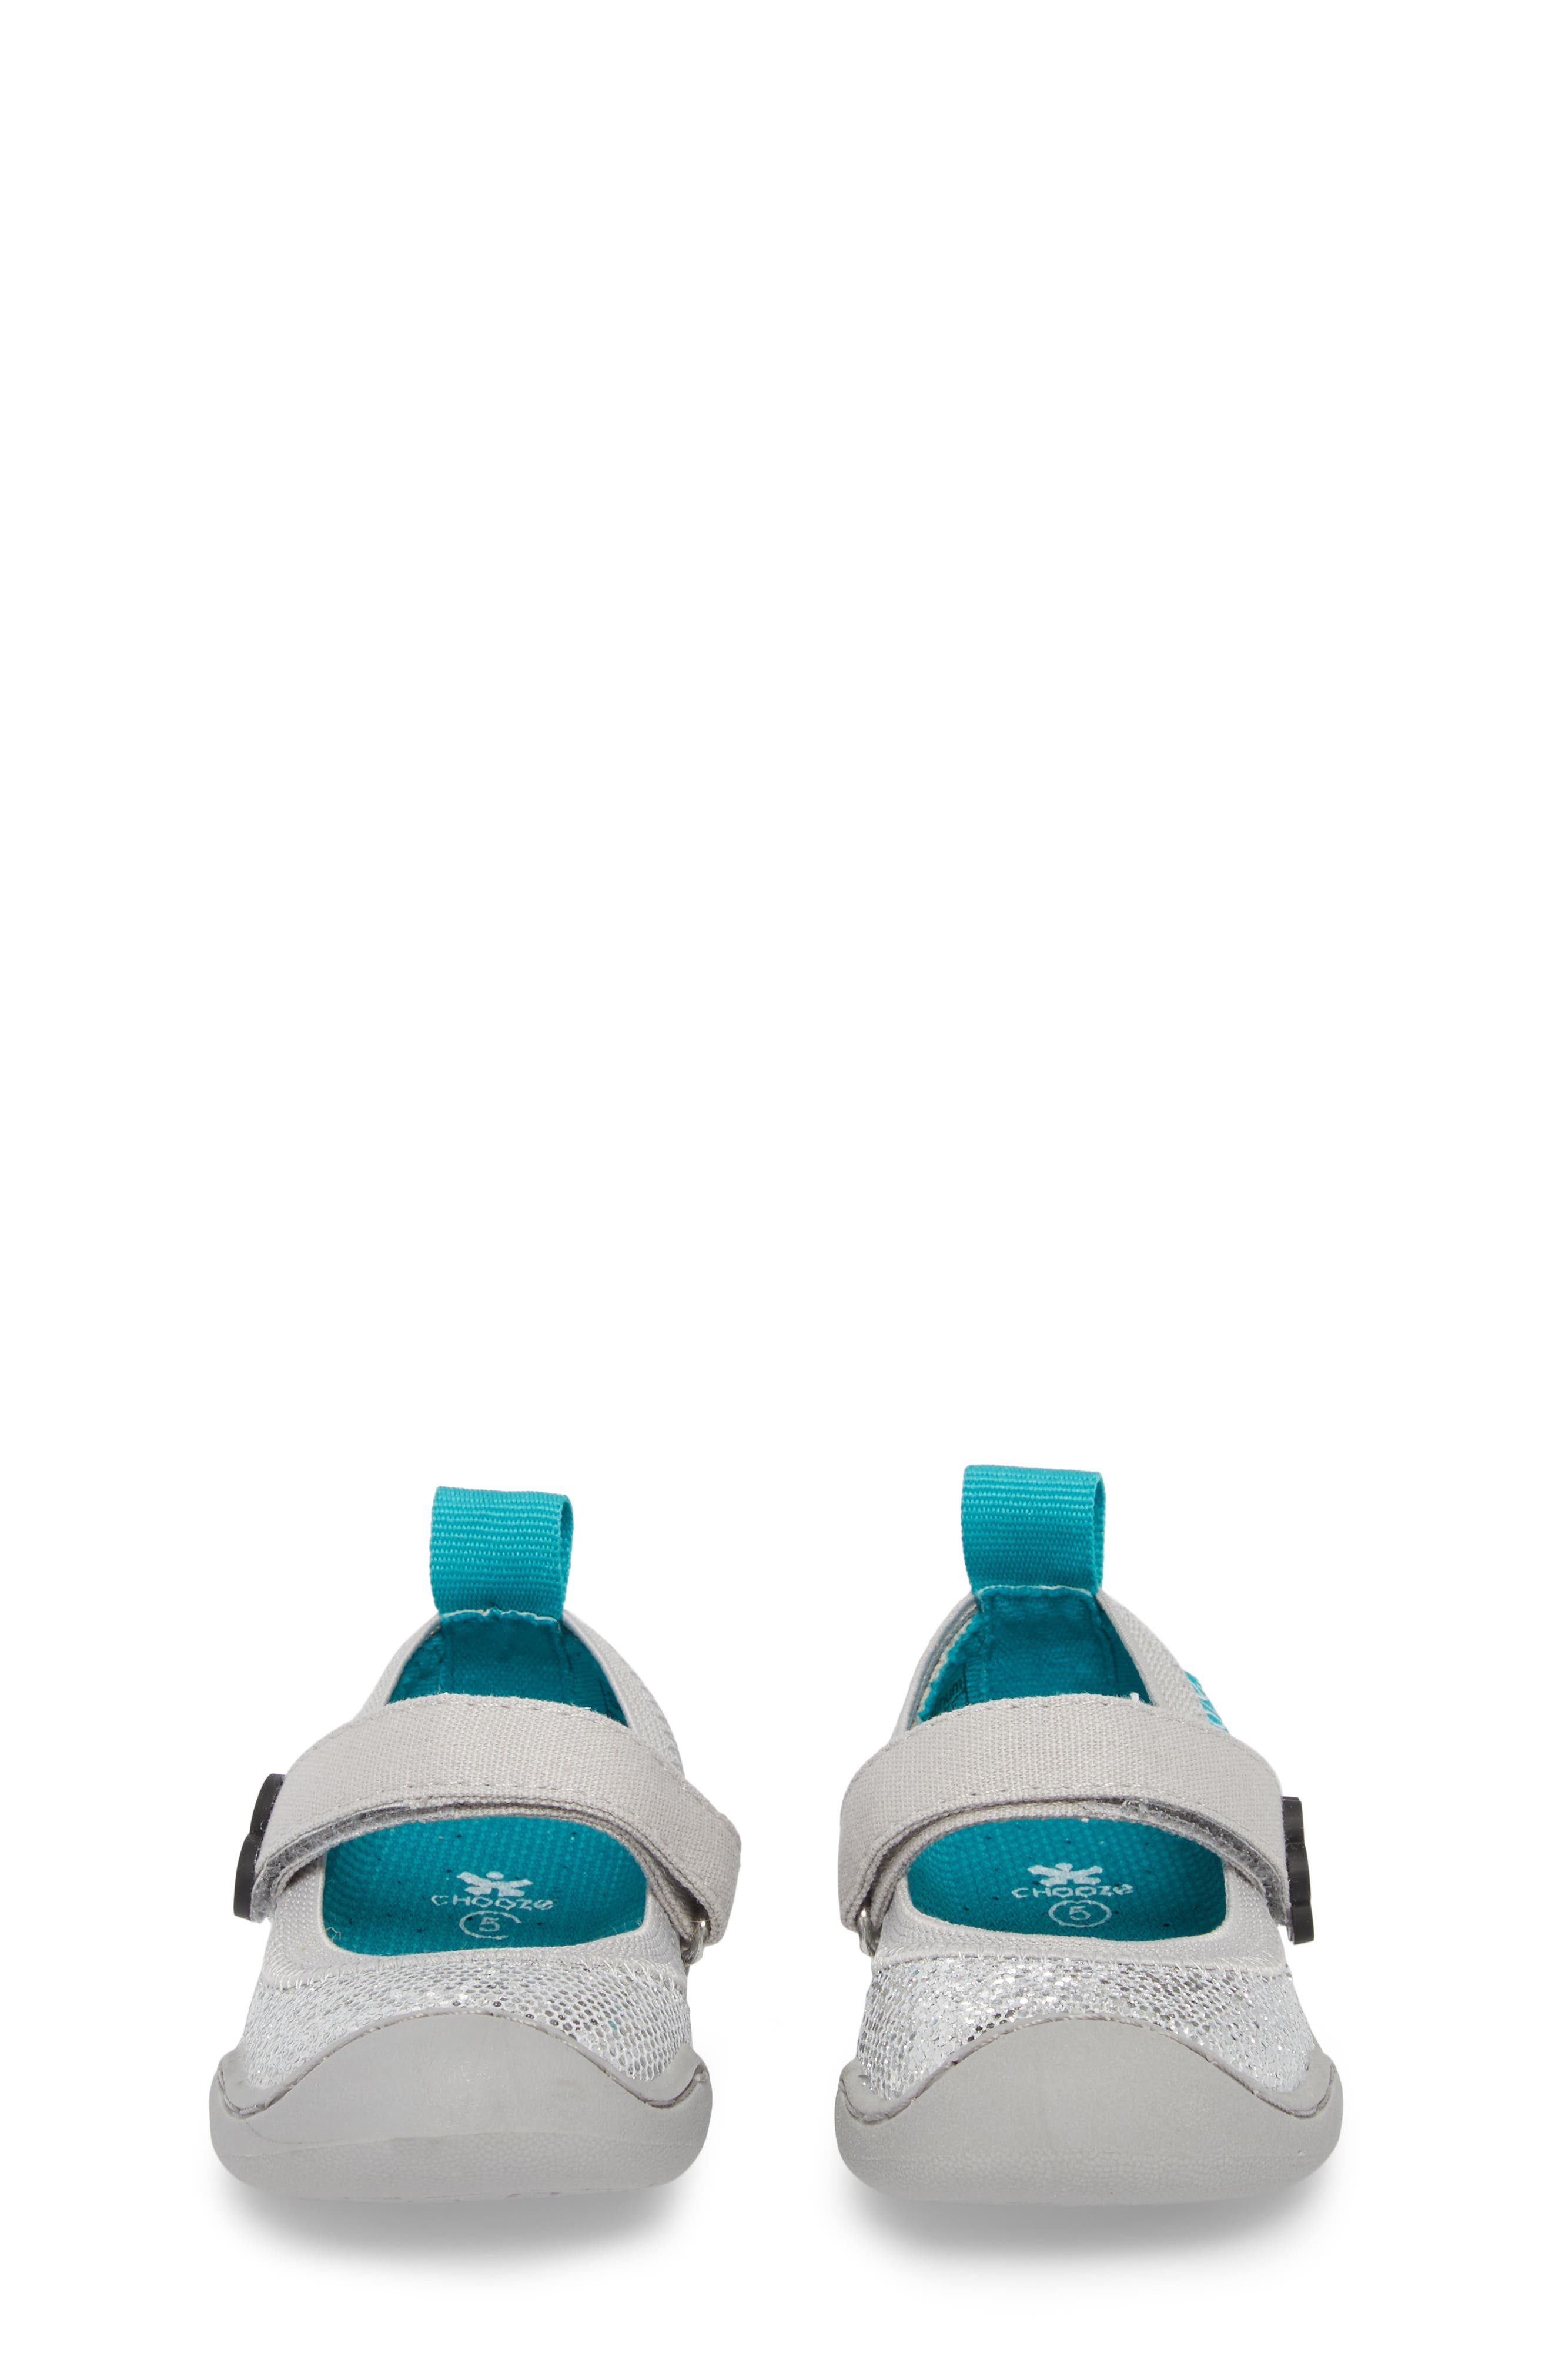 CHOOZE, Steady Shimmer Mary Jane Sneaker, Alternate thumbnail 5, color, GLOW PLATINUM